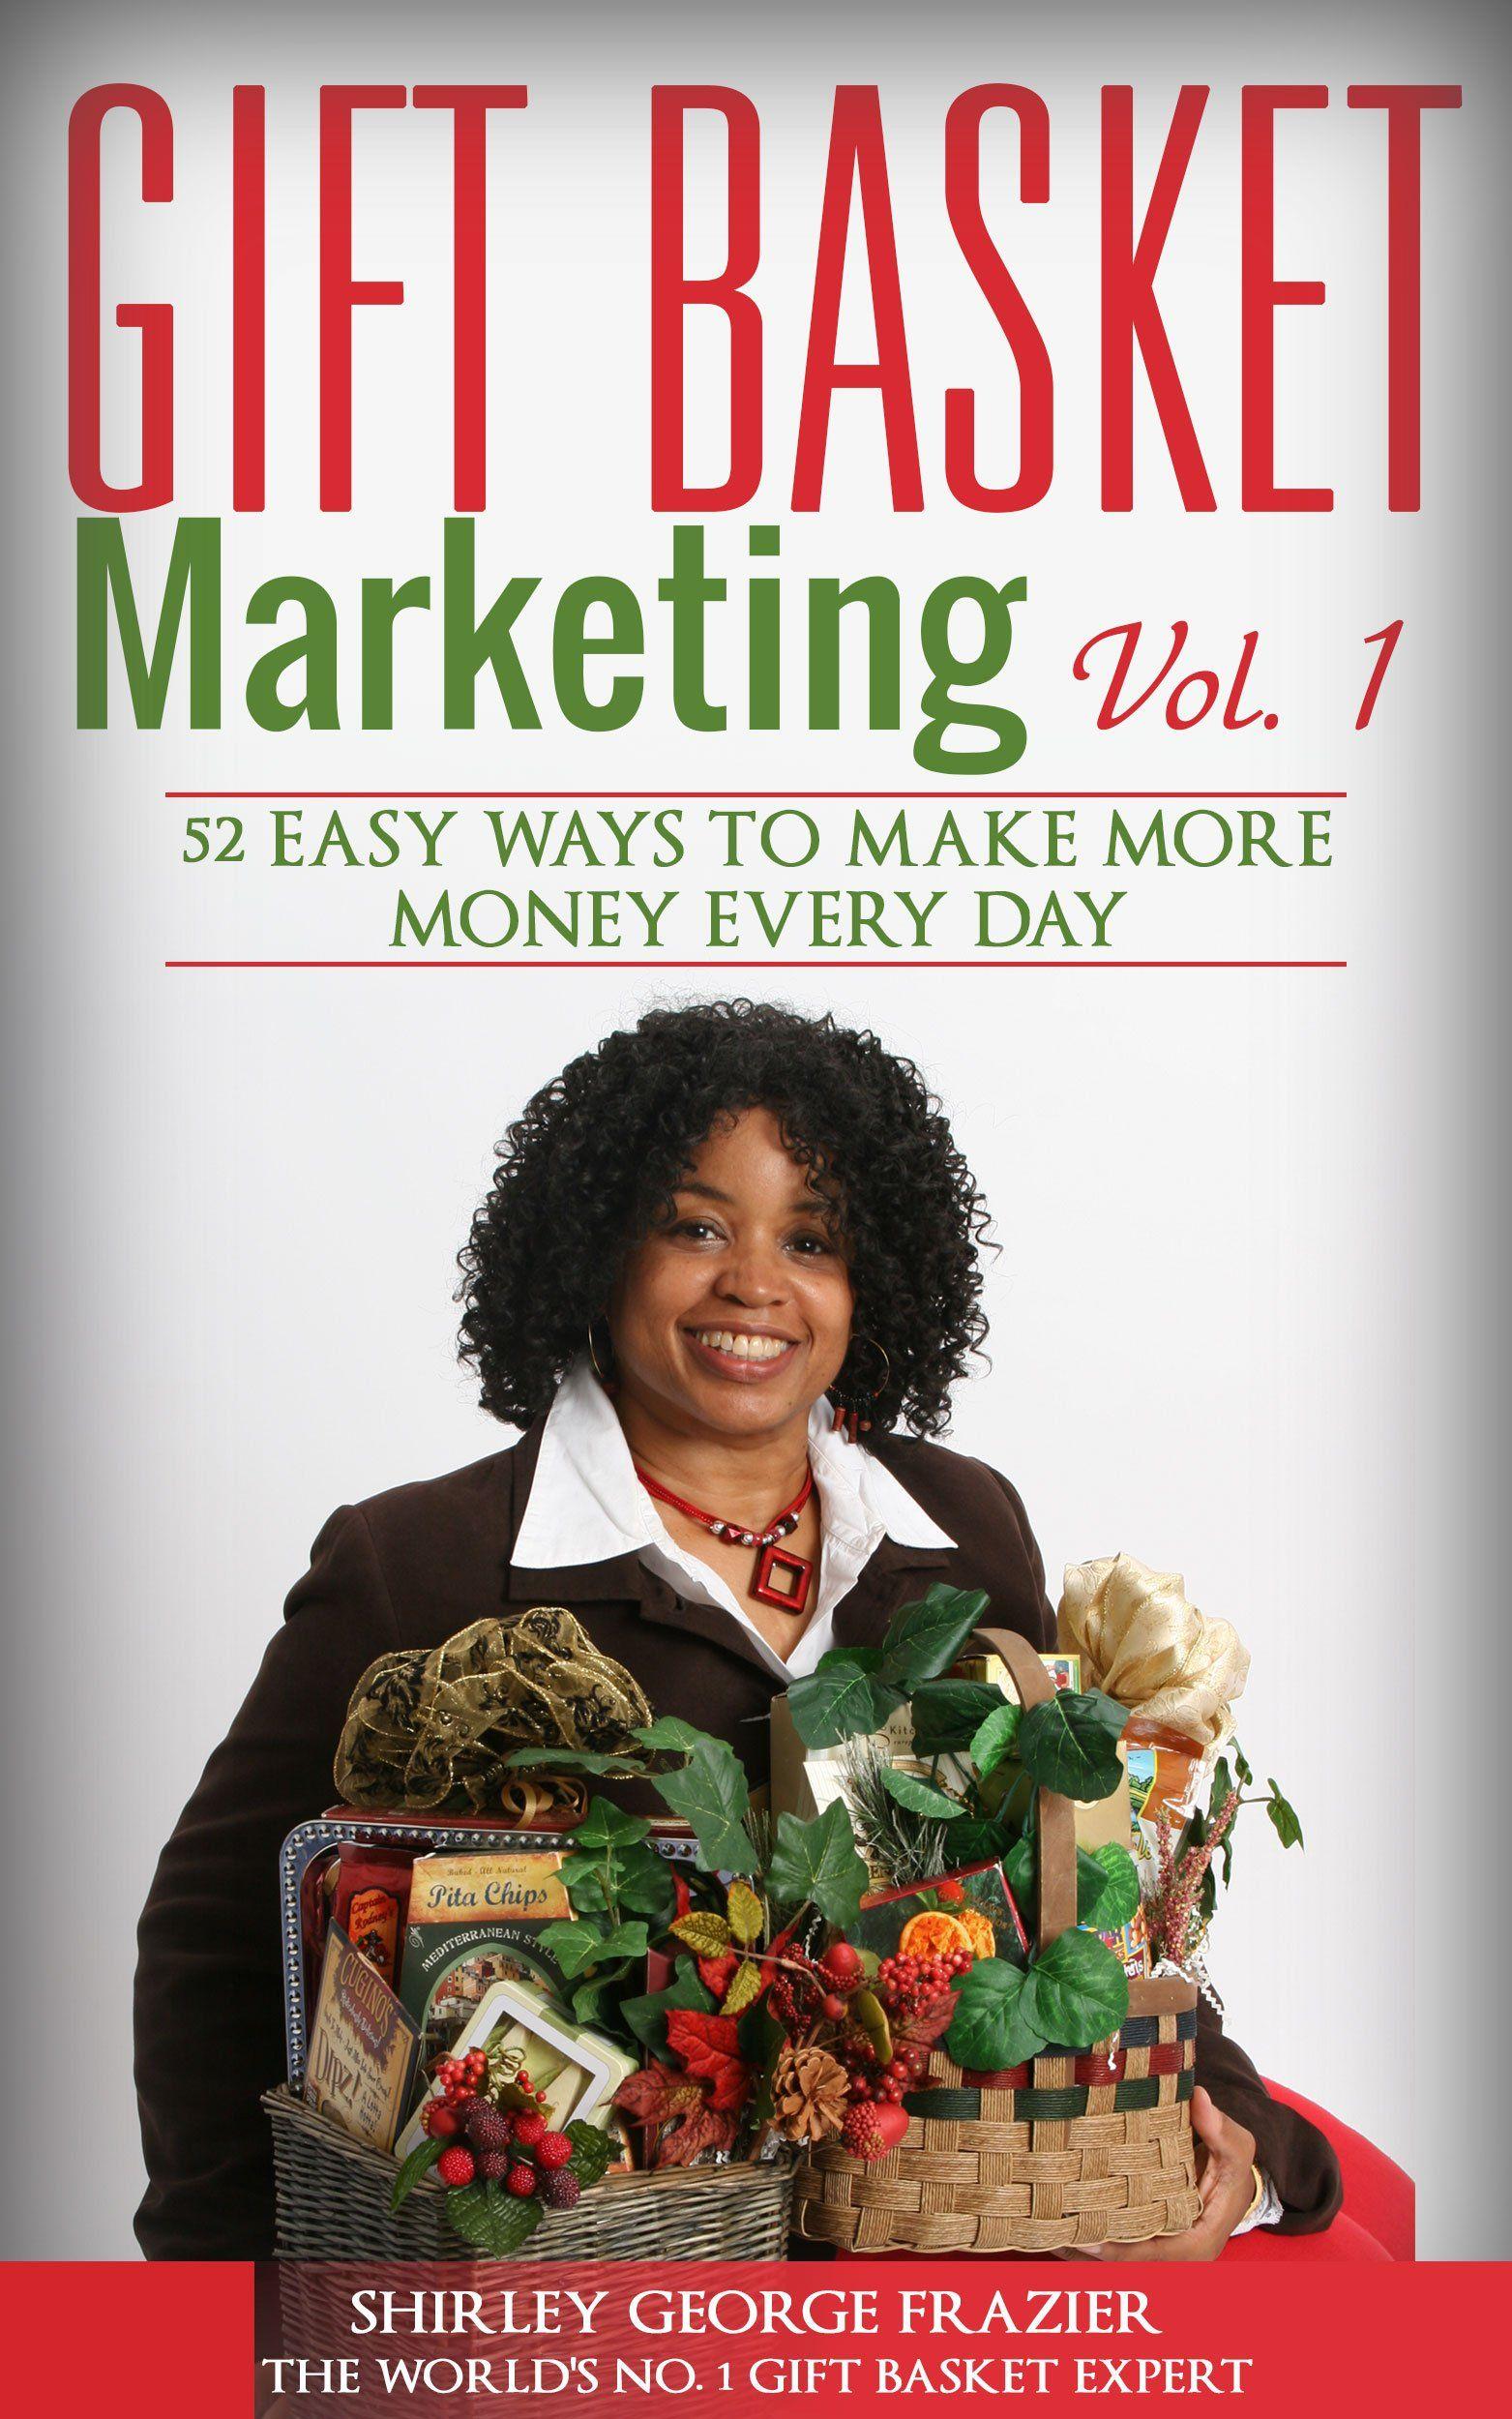 T Basket Marketing Vol 1 By Shirley George Frazier